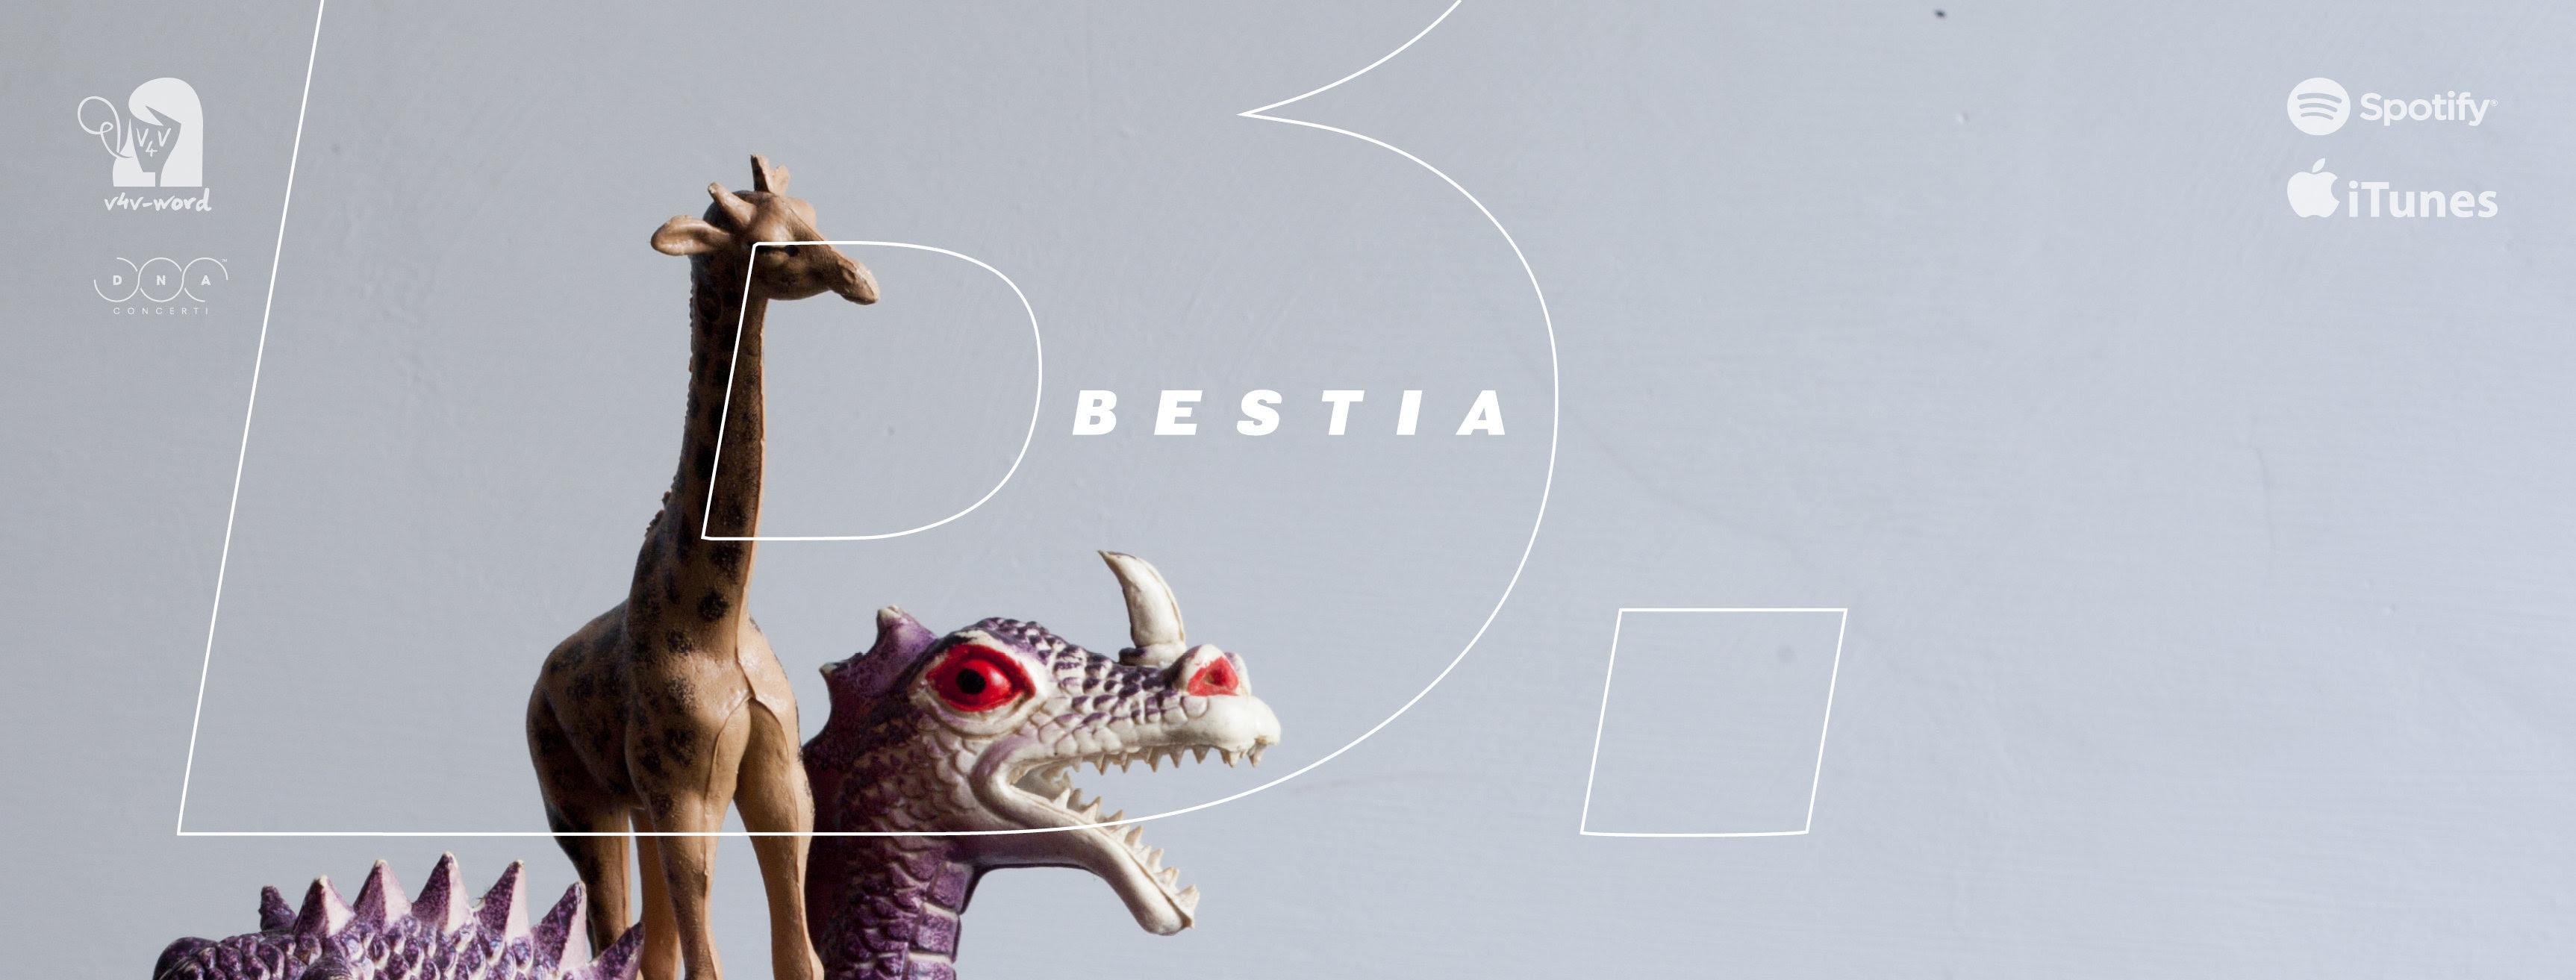 b x bestia